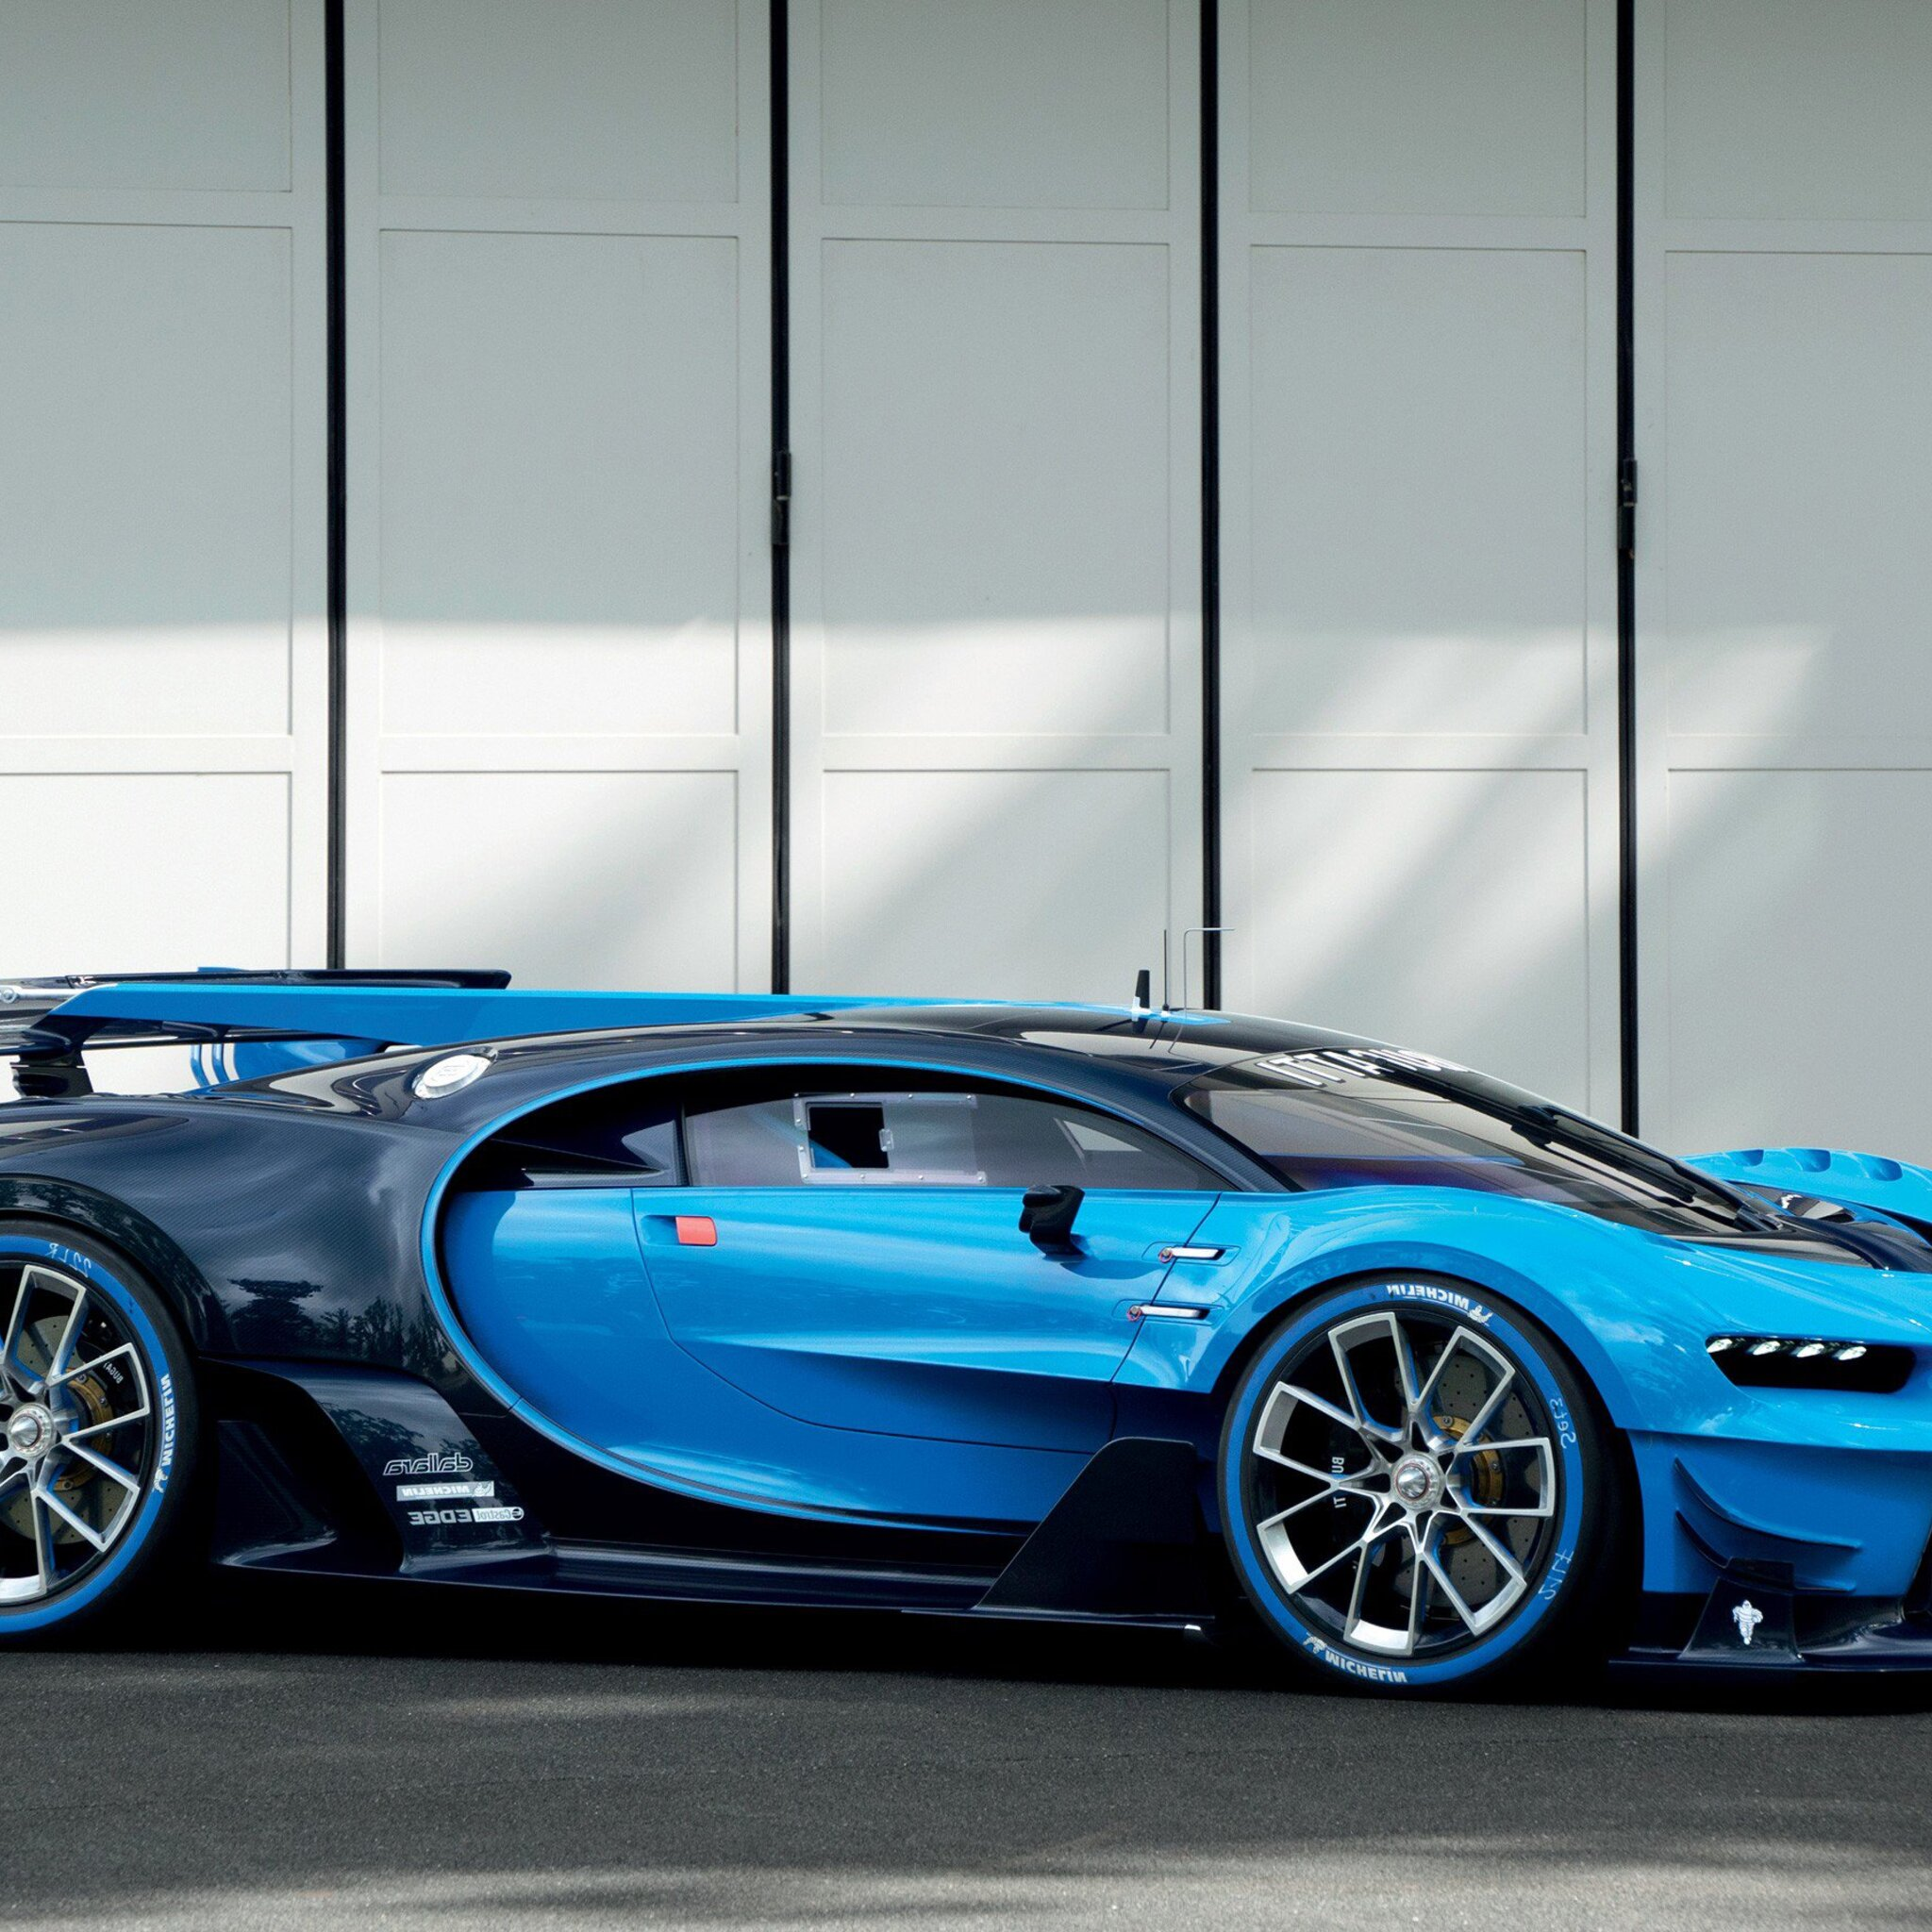 2048x2048 Bugatti Vision Gran Turismo PC Ipad Air HD 4k